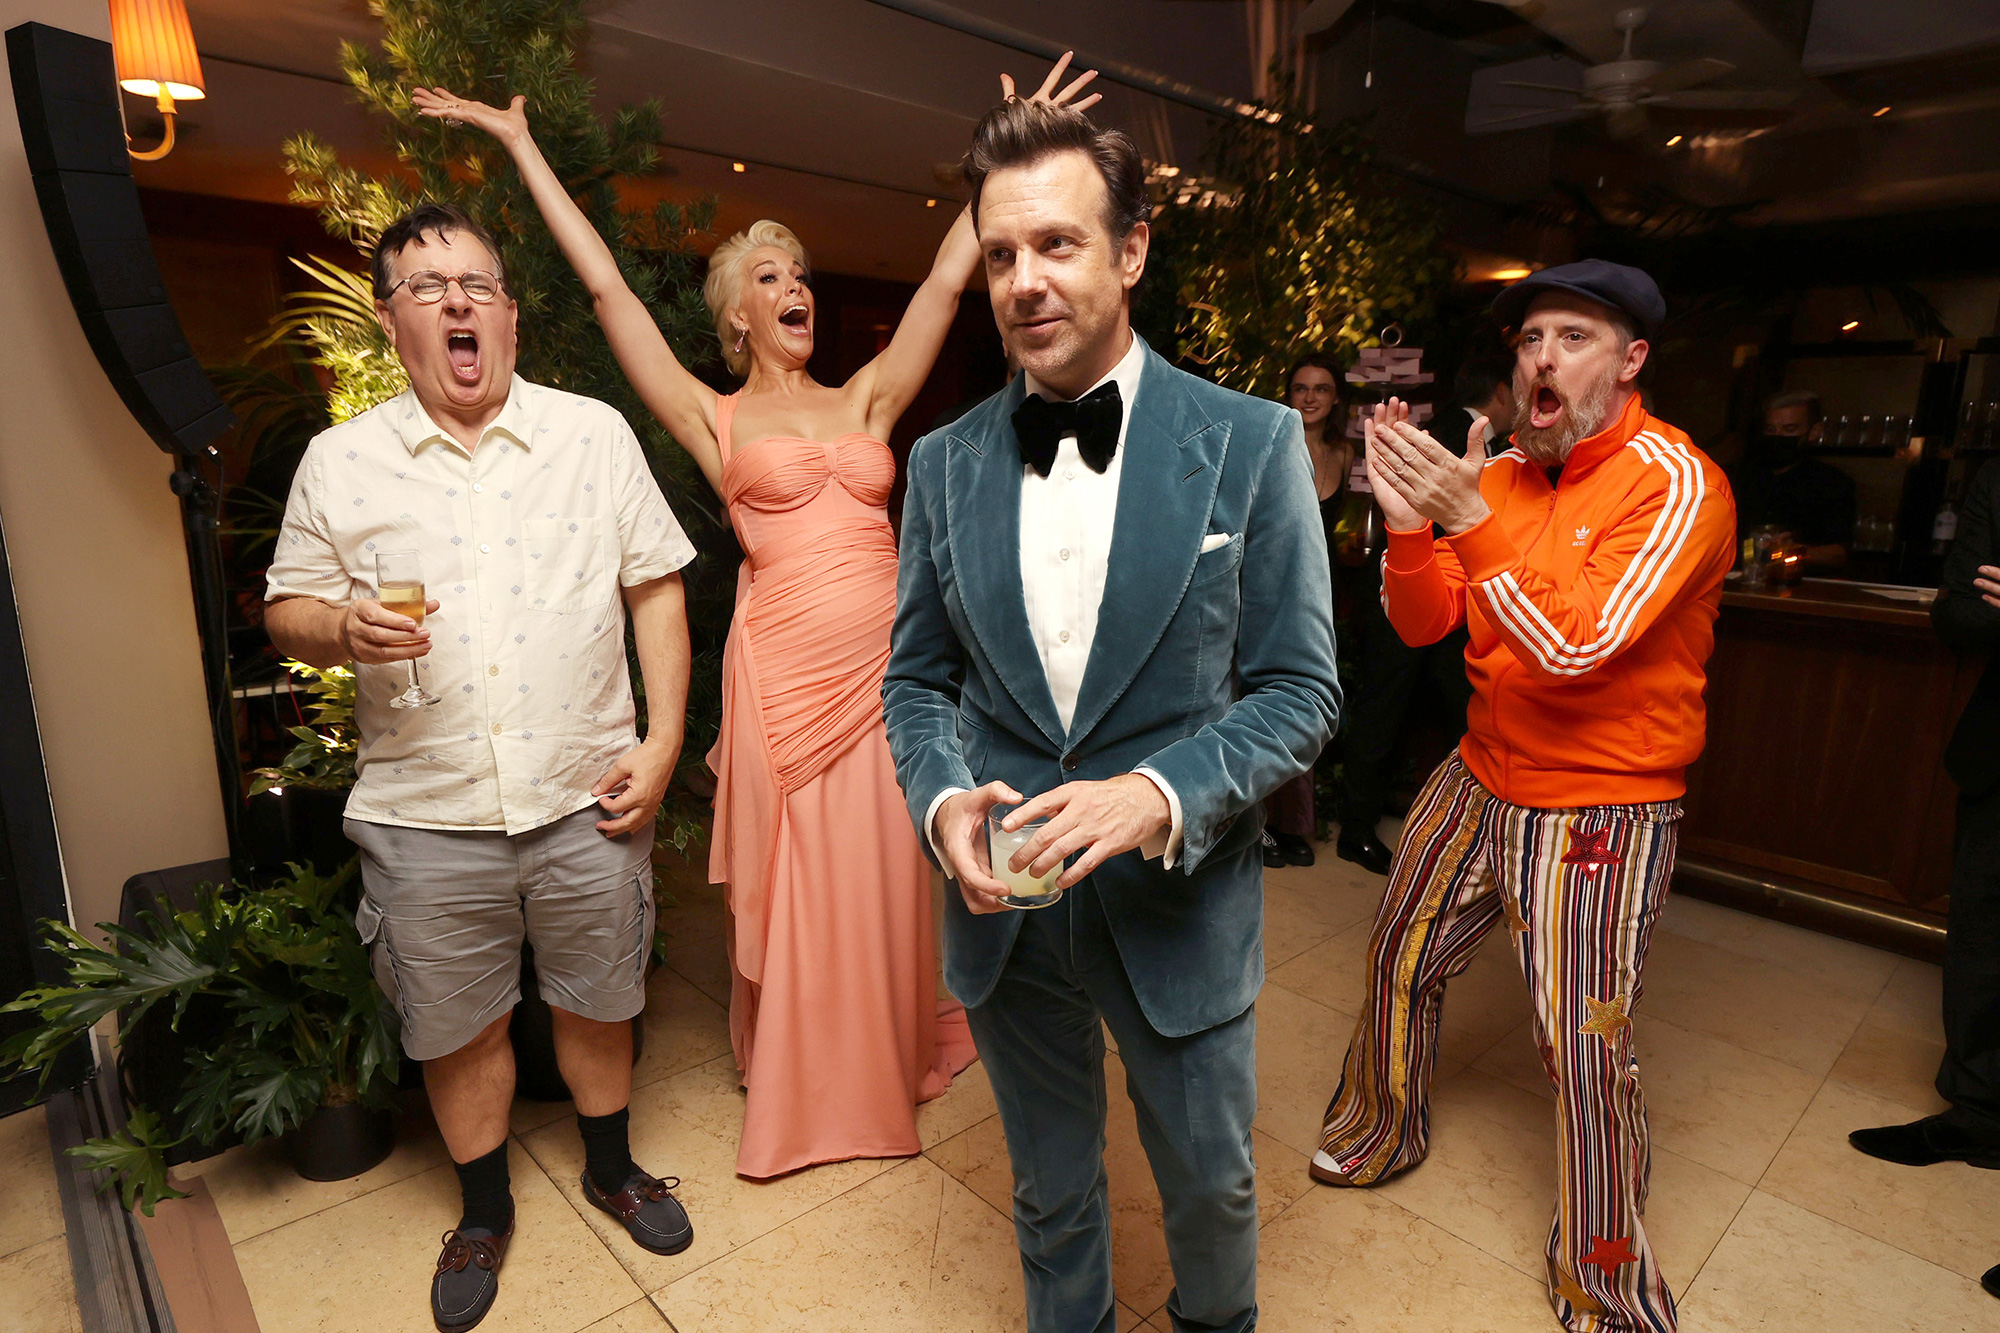 Apple TV+ Ted Lasso Emmy Awards Party Jeremy Swift, Hannah Waddingham, Jason Sudeikis and Brendan Hunt